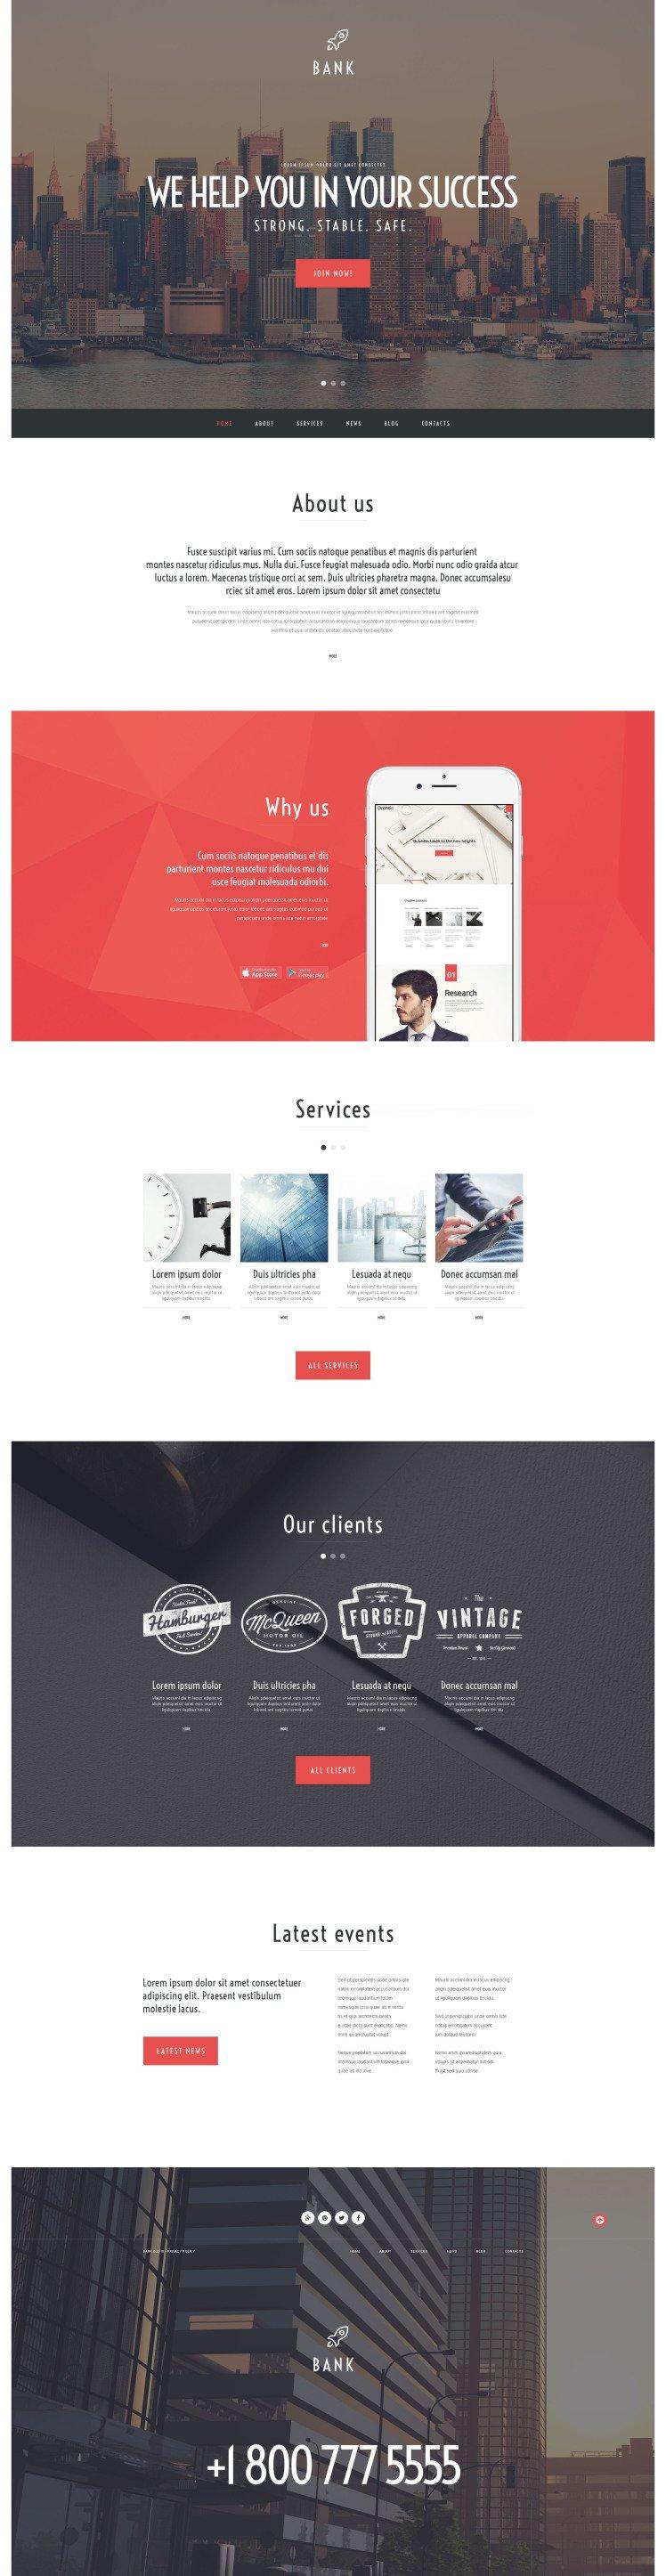 Bank WordPress Themes